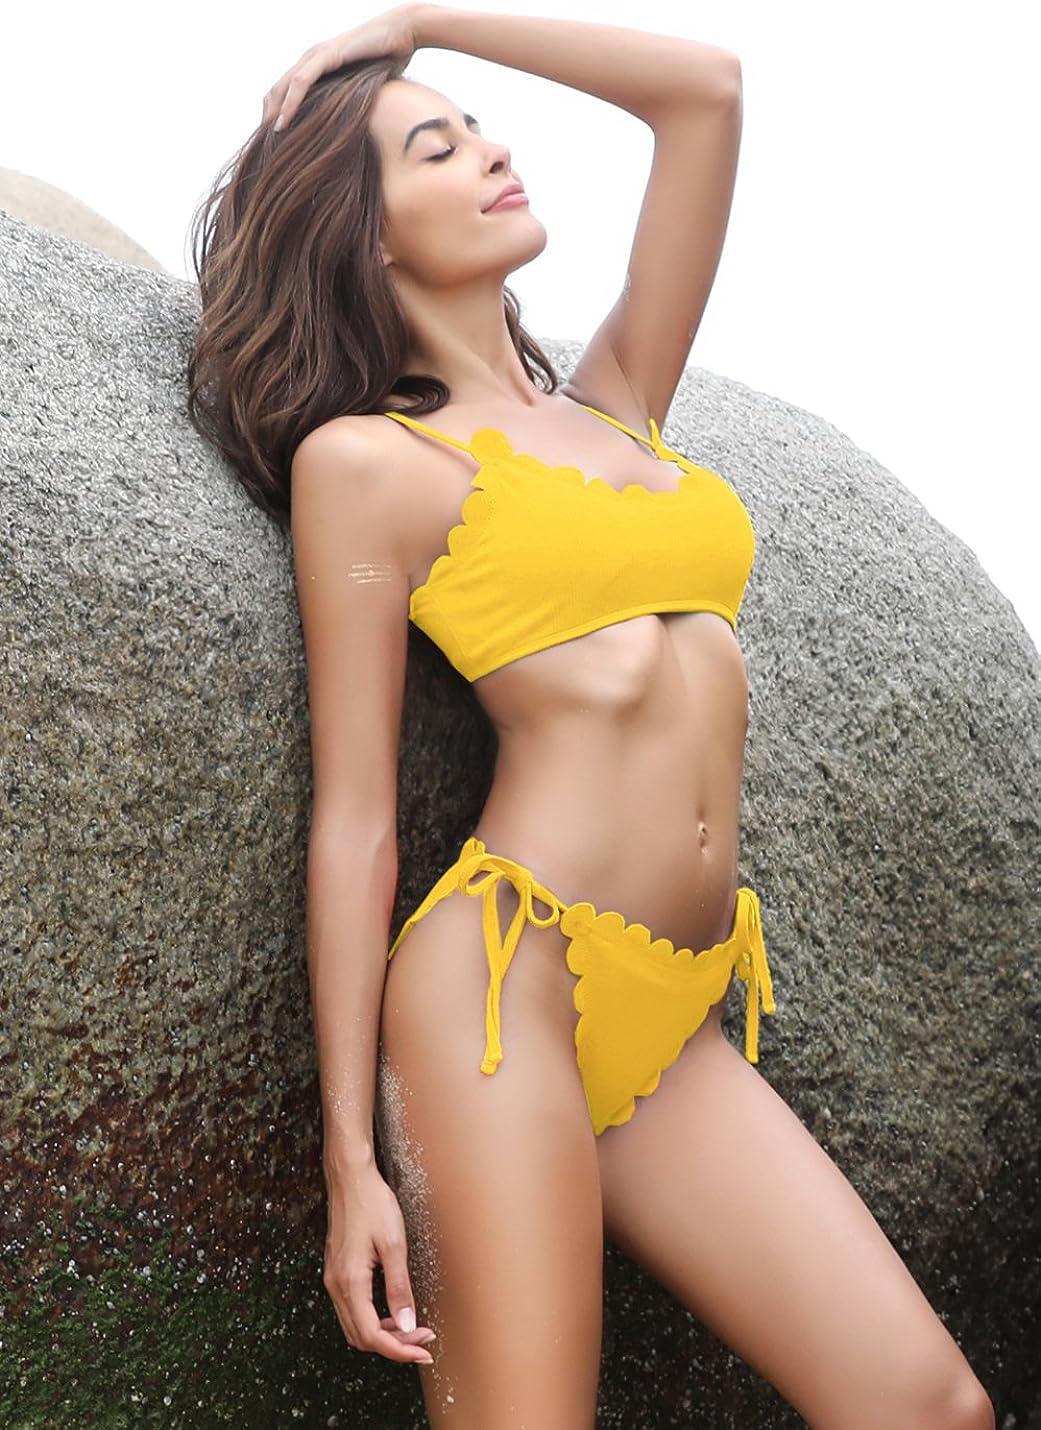 SHEKINI Damen Triangel Bikini-Set Neckholder Gepolstert Bademode Schn/ürung Bikinislip Zweiteiler Badeanzug